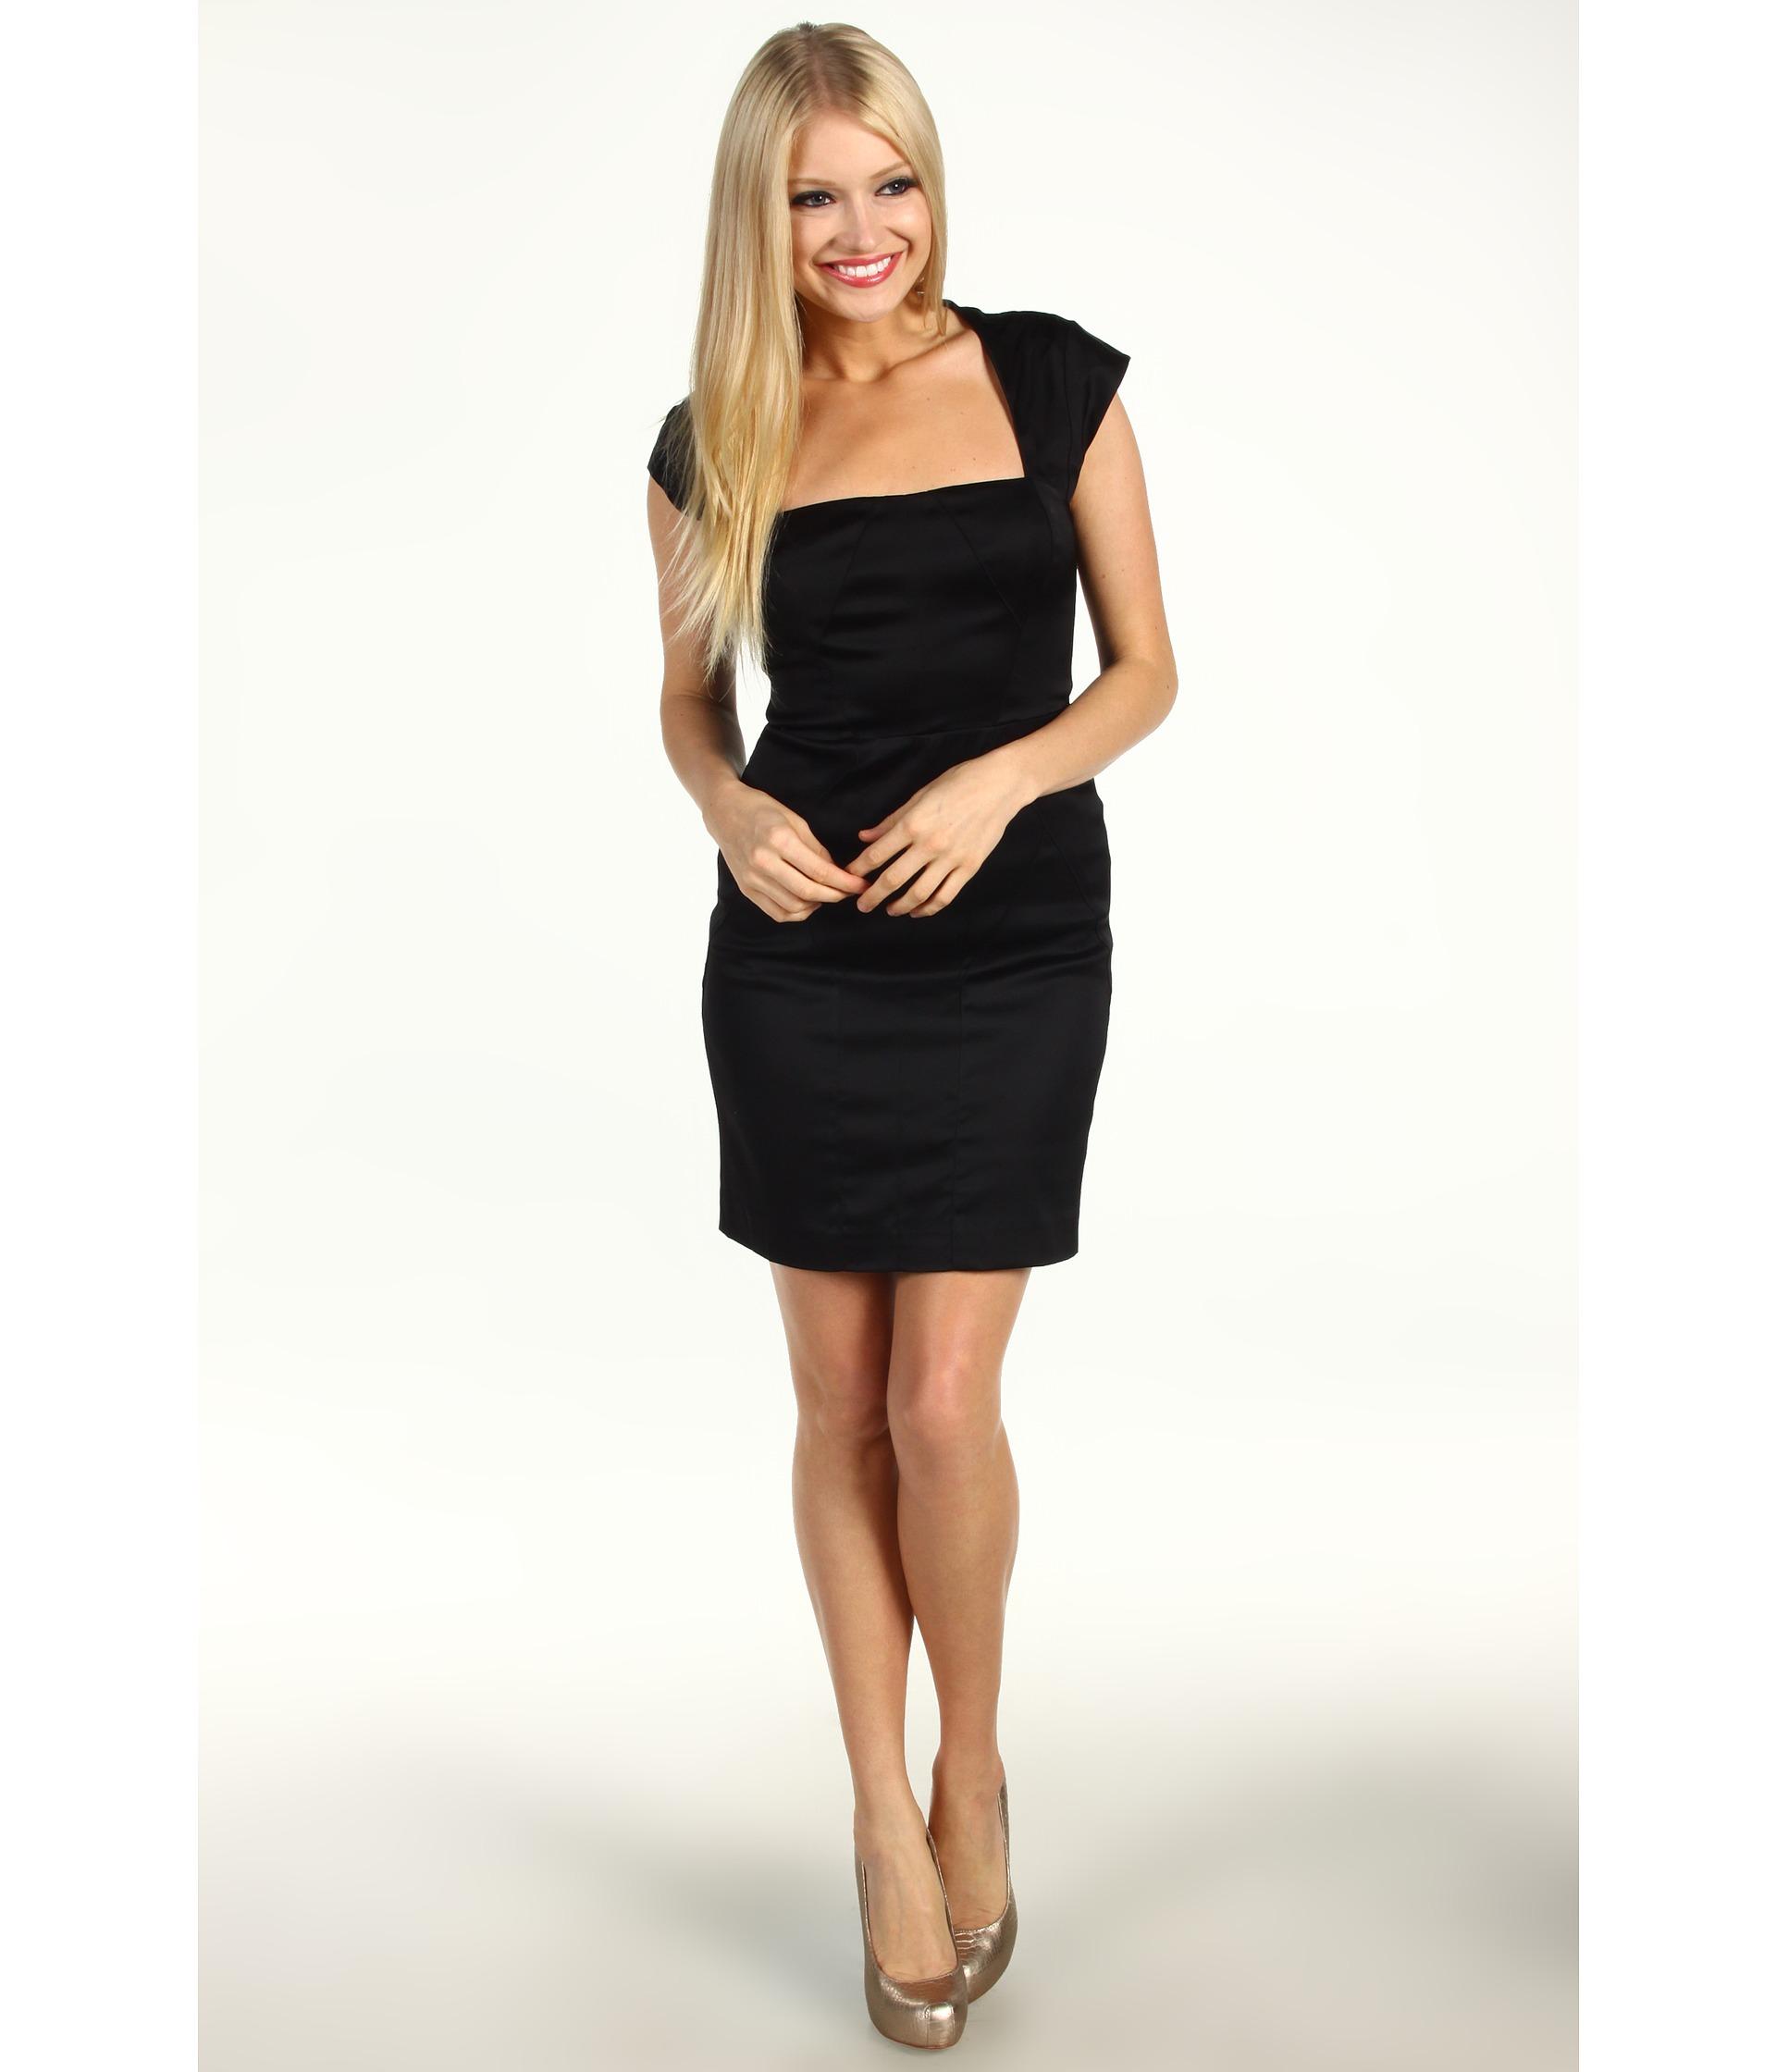 Nicole Miller Square Neck Sheath Dress $174.99 (  MSRP $385